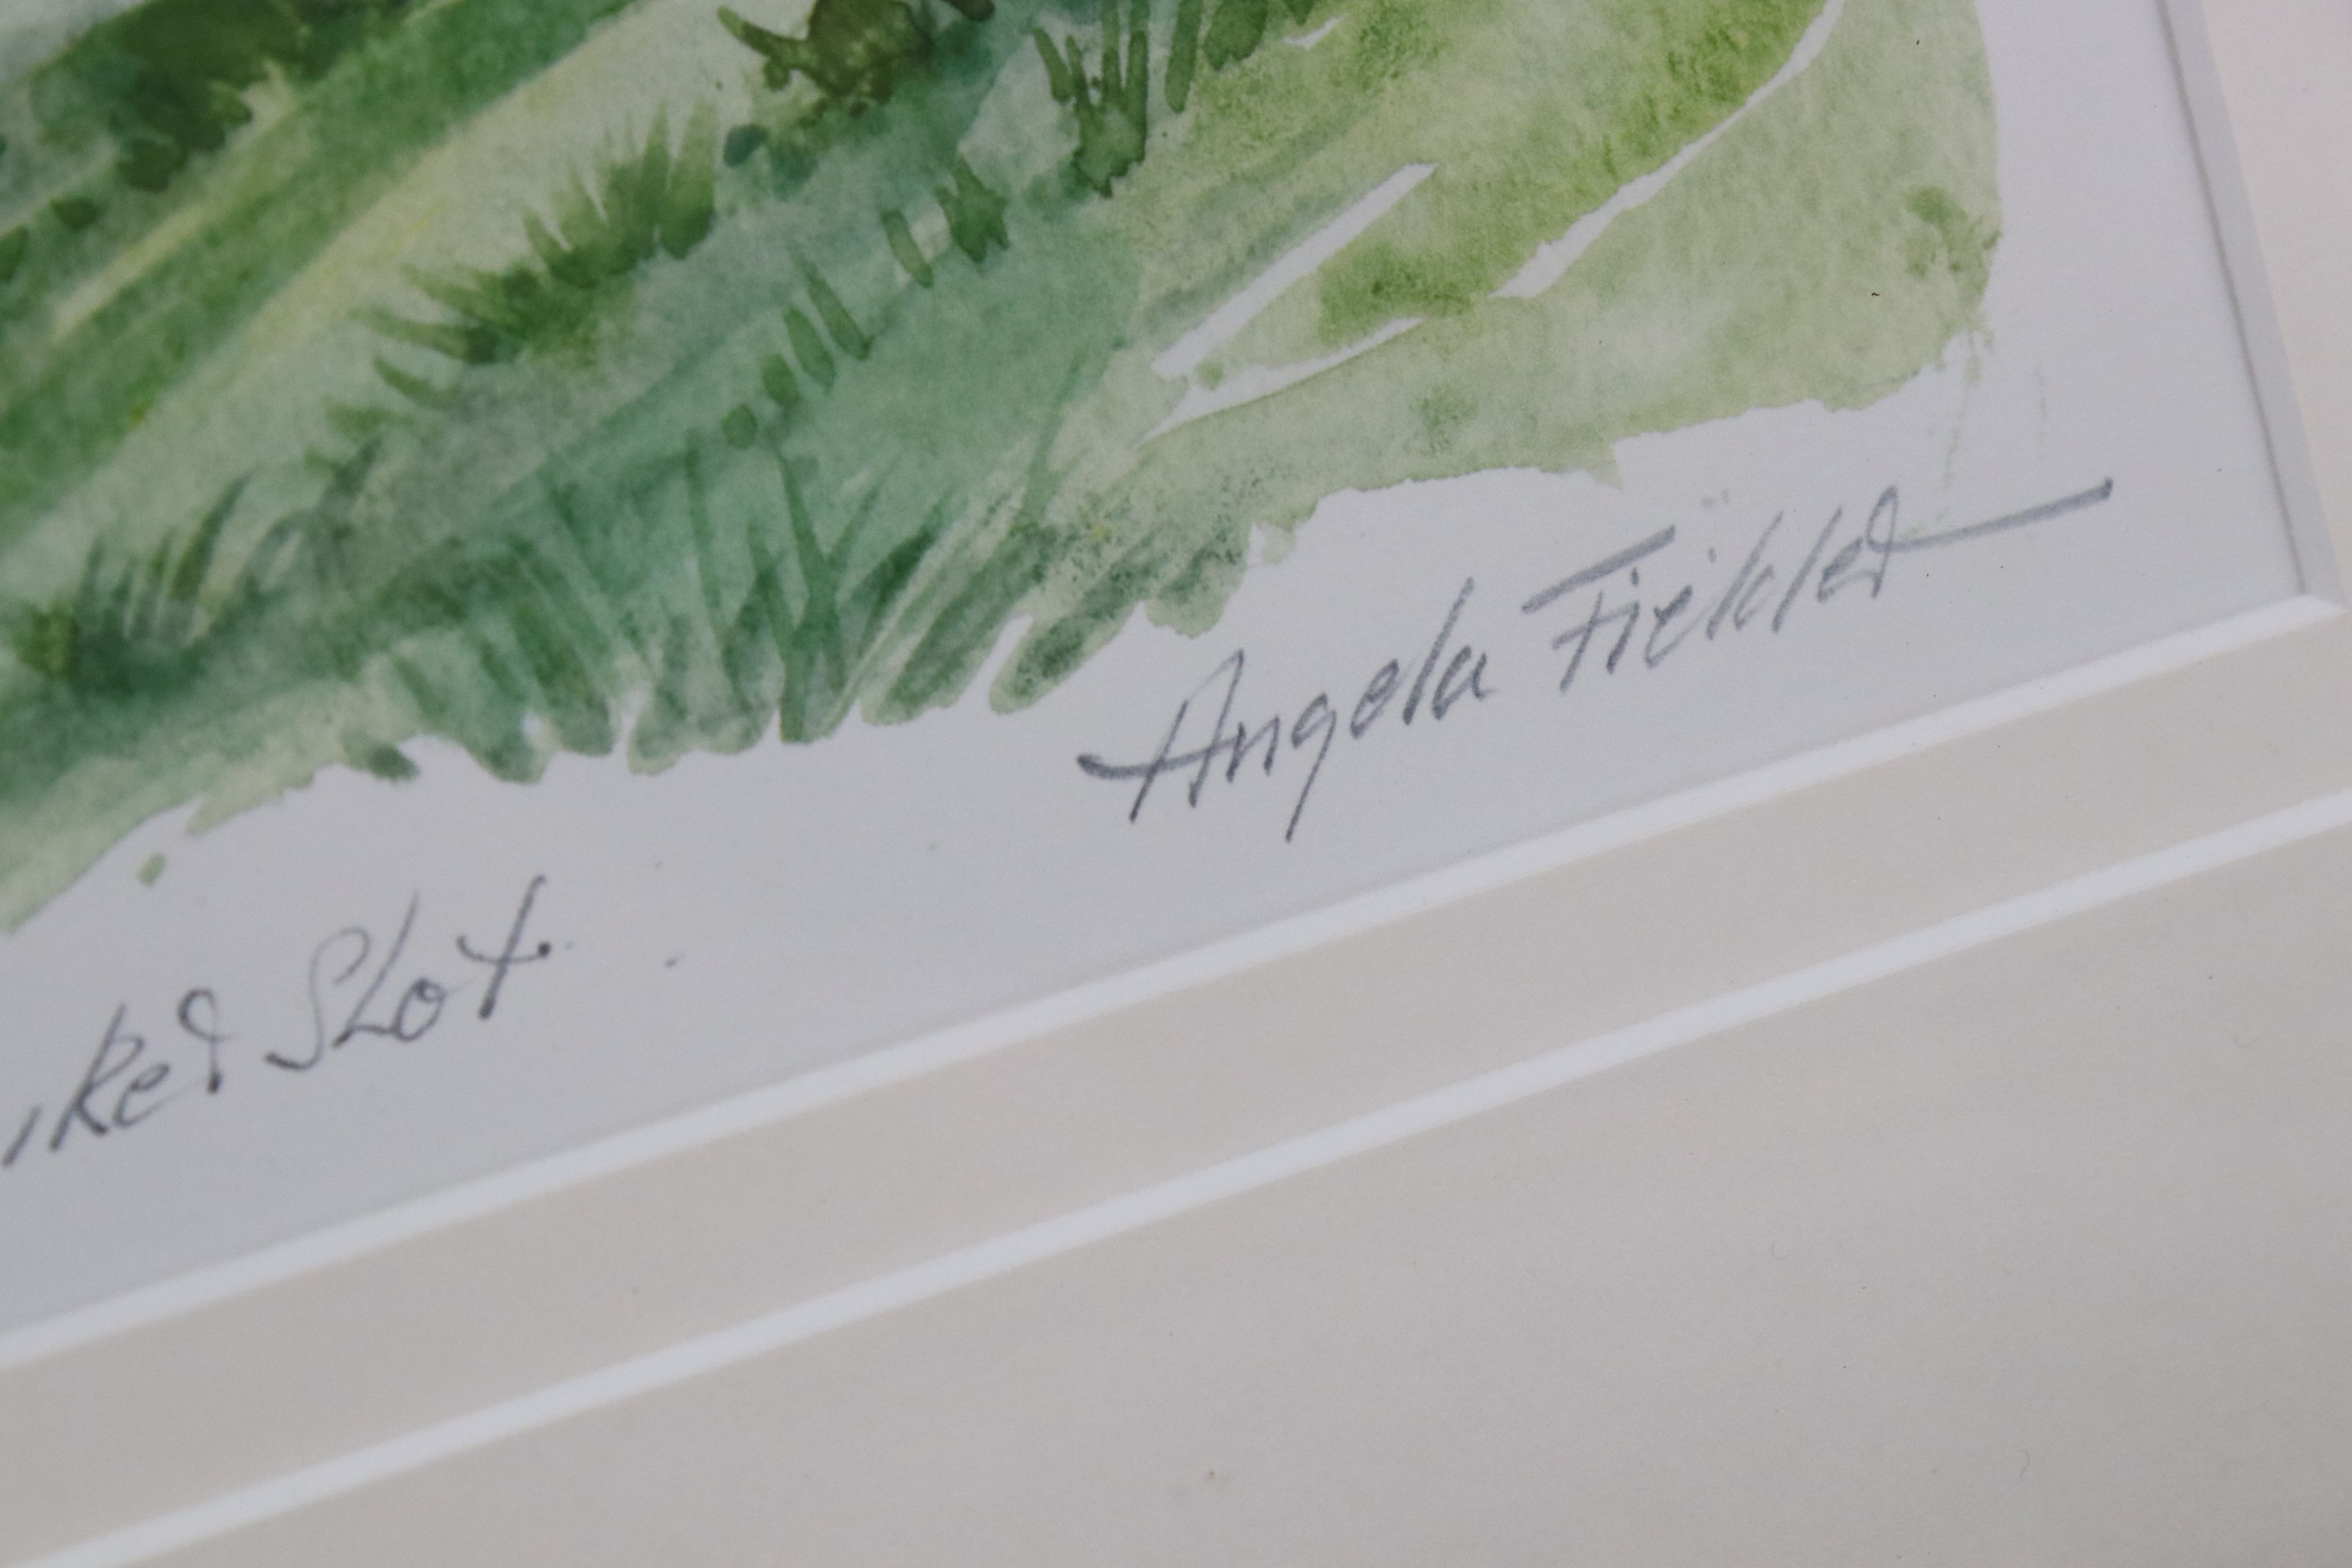 Tim Bulmer (cartoonist) a pair of humorous tennis watercolour cartoons & a signed Angela Fielder - Image 4 of 7